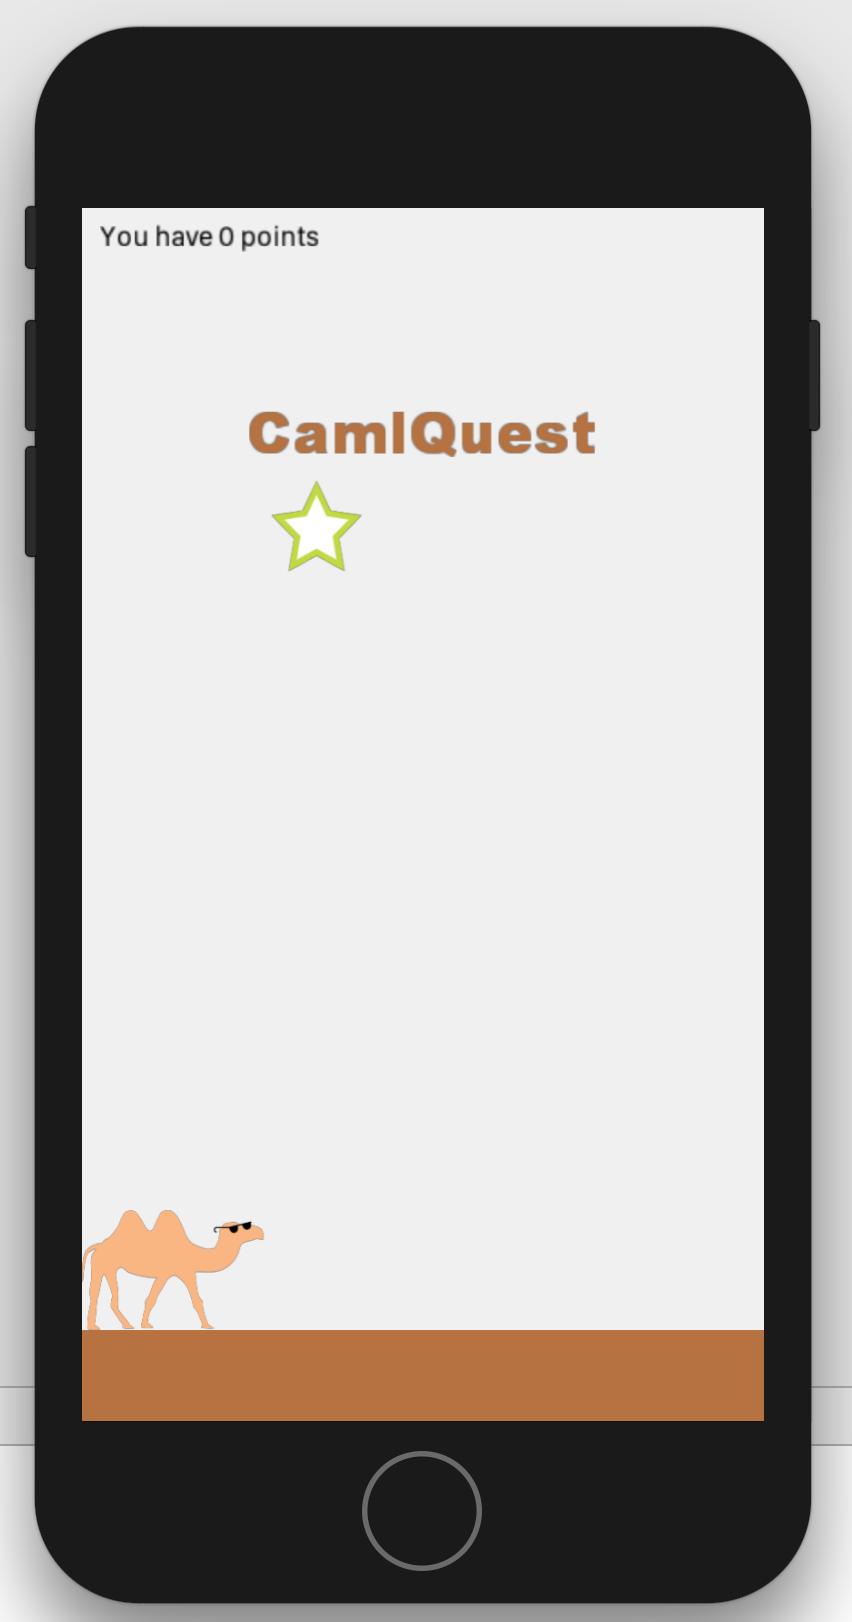 screenshot of the game running in the ios simulator